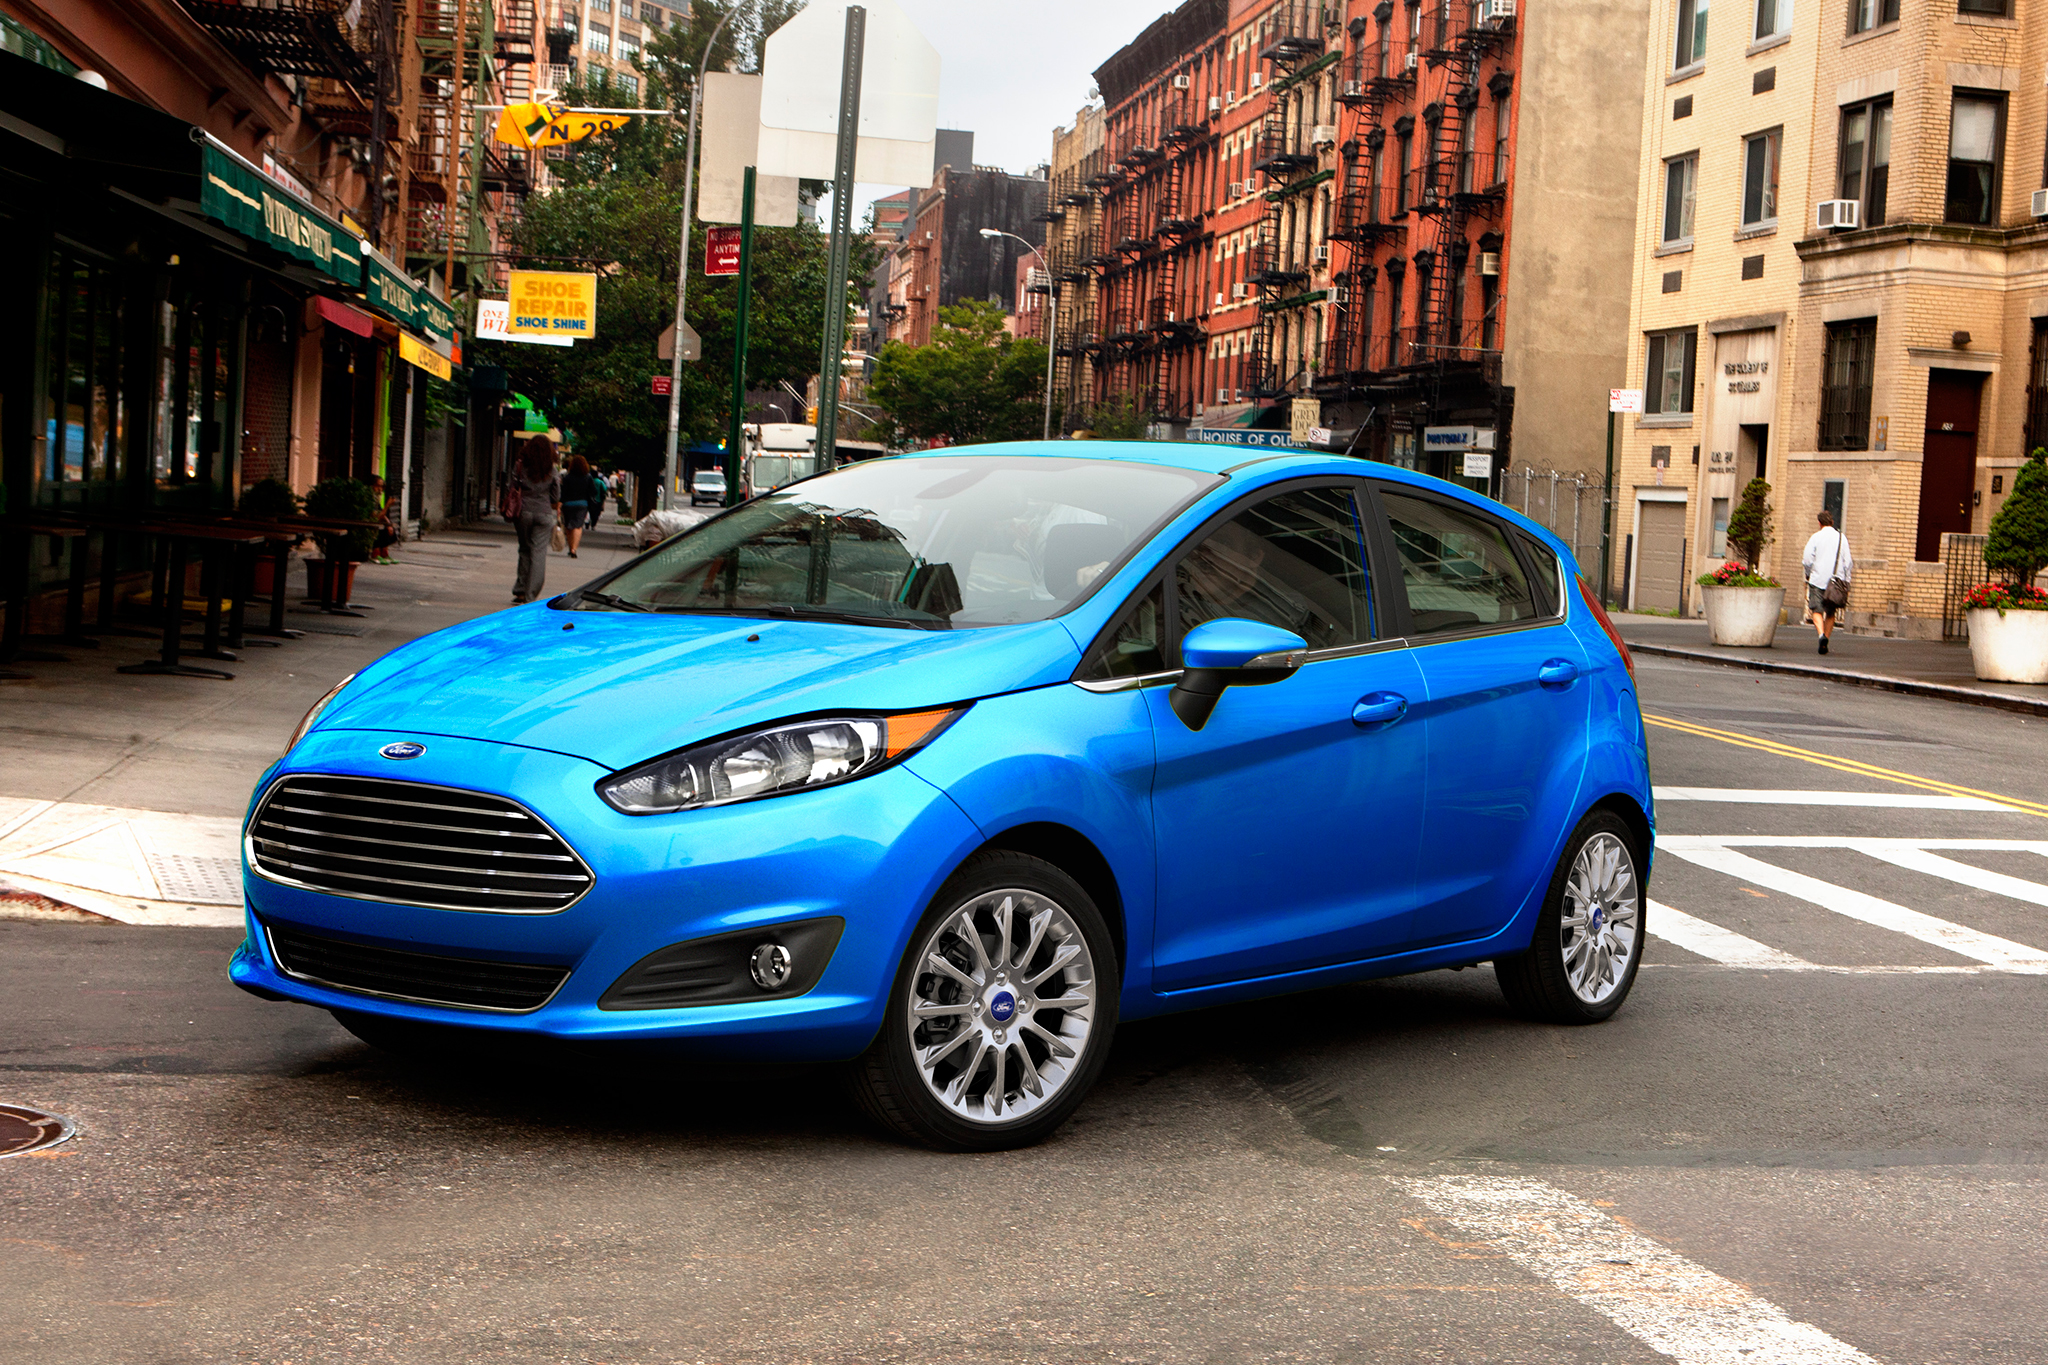 2017-Ford-Fiesta-front-three-quarter-01-1.jpg